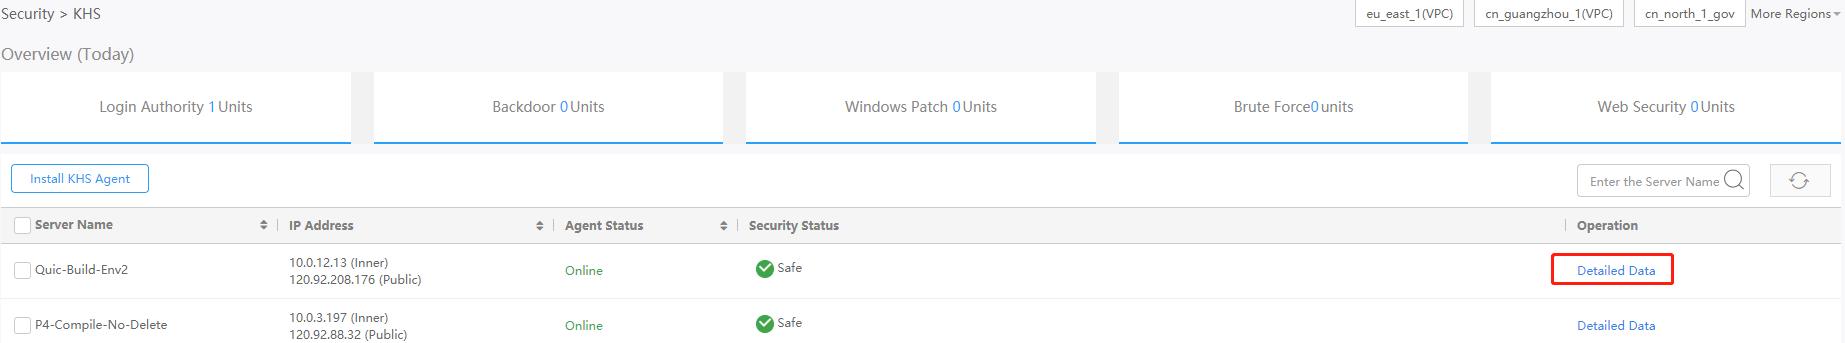 Configure features